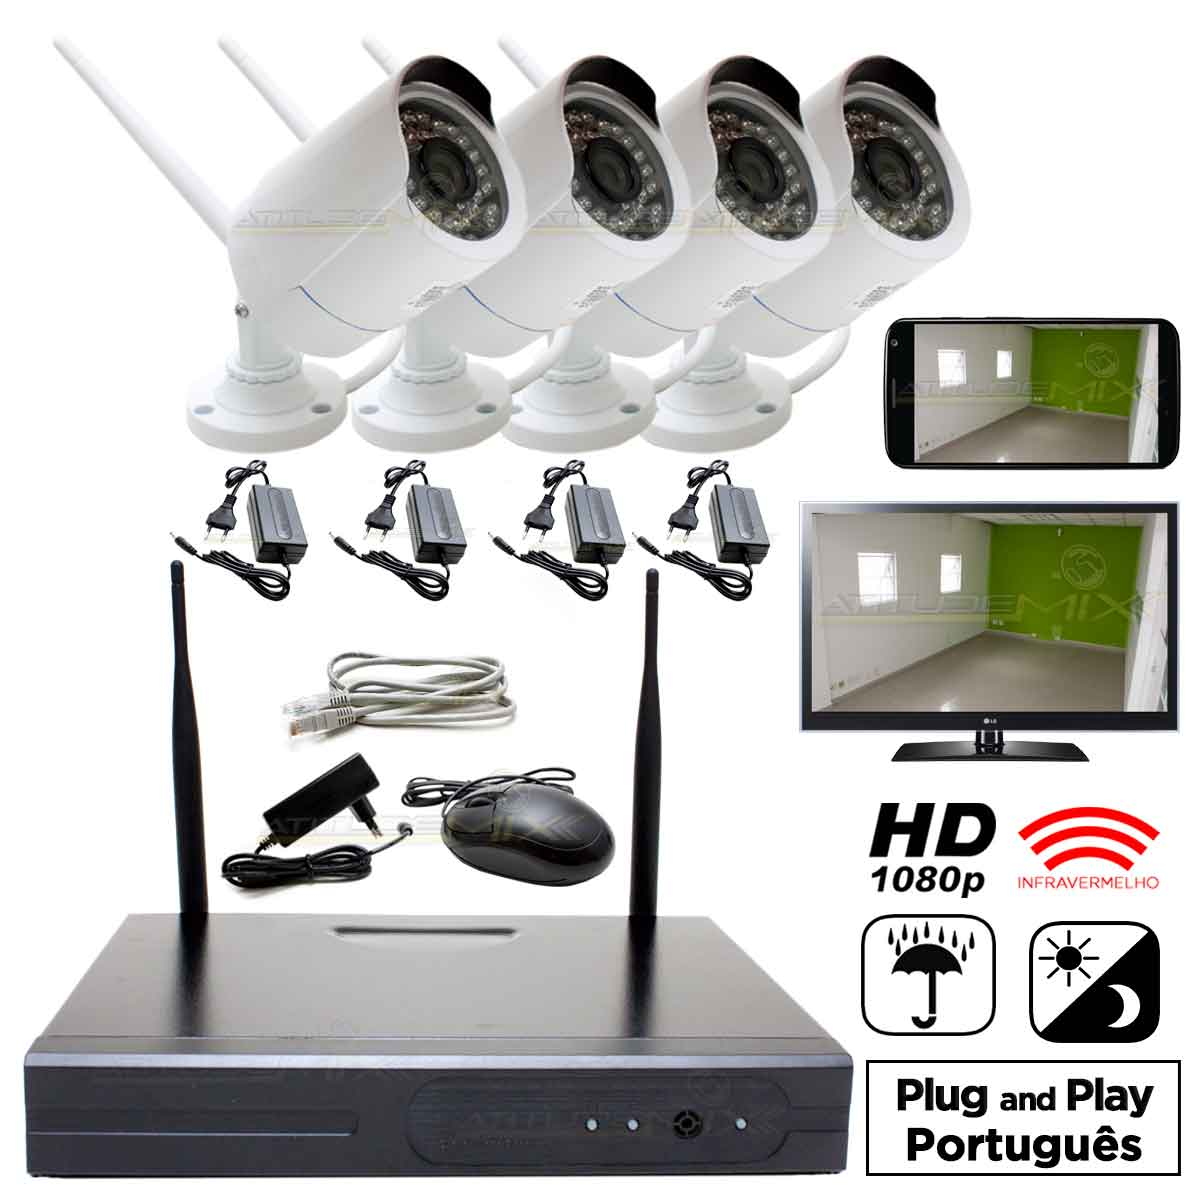 Kit Nvr 4 Câmeras 1.3mp Infra Wi-fi 100m Hd 1080p P2p Cftv